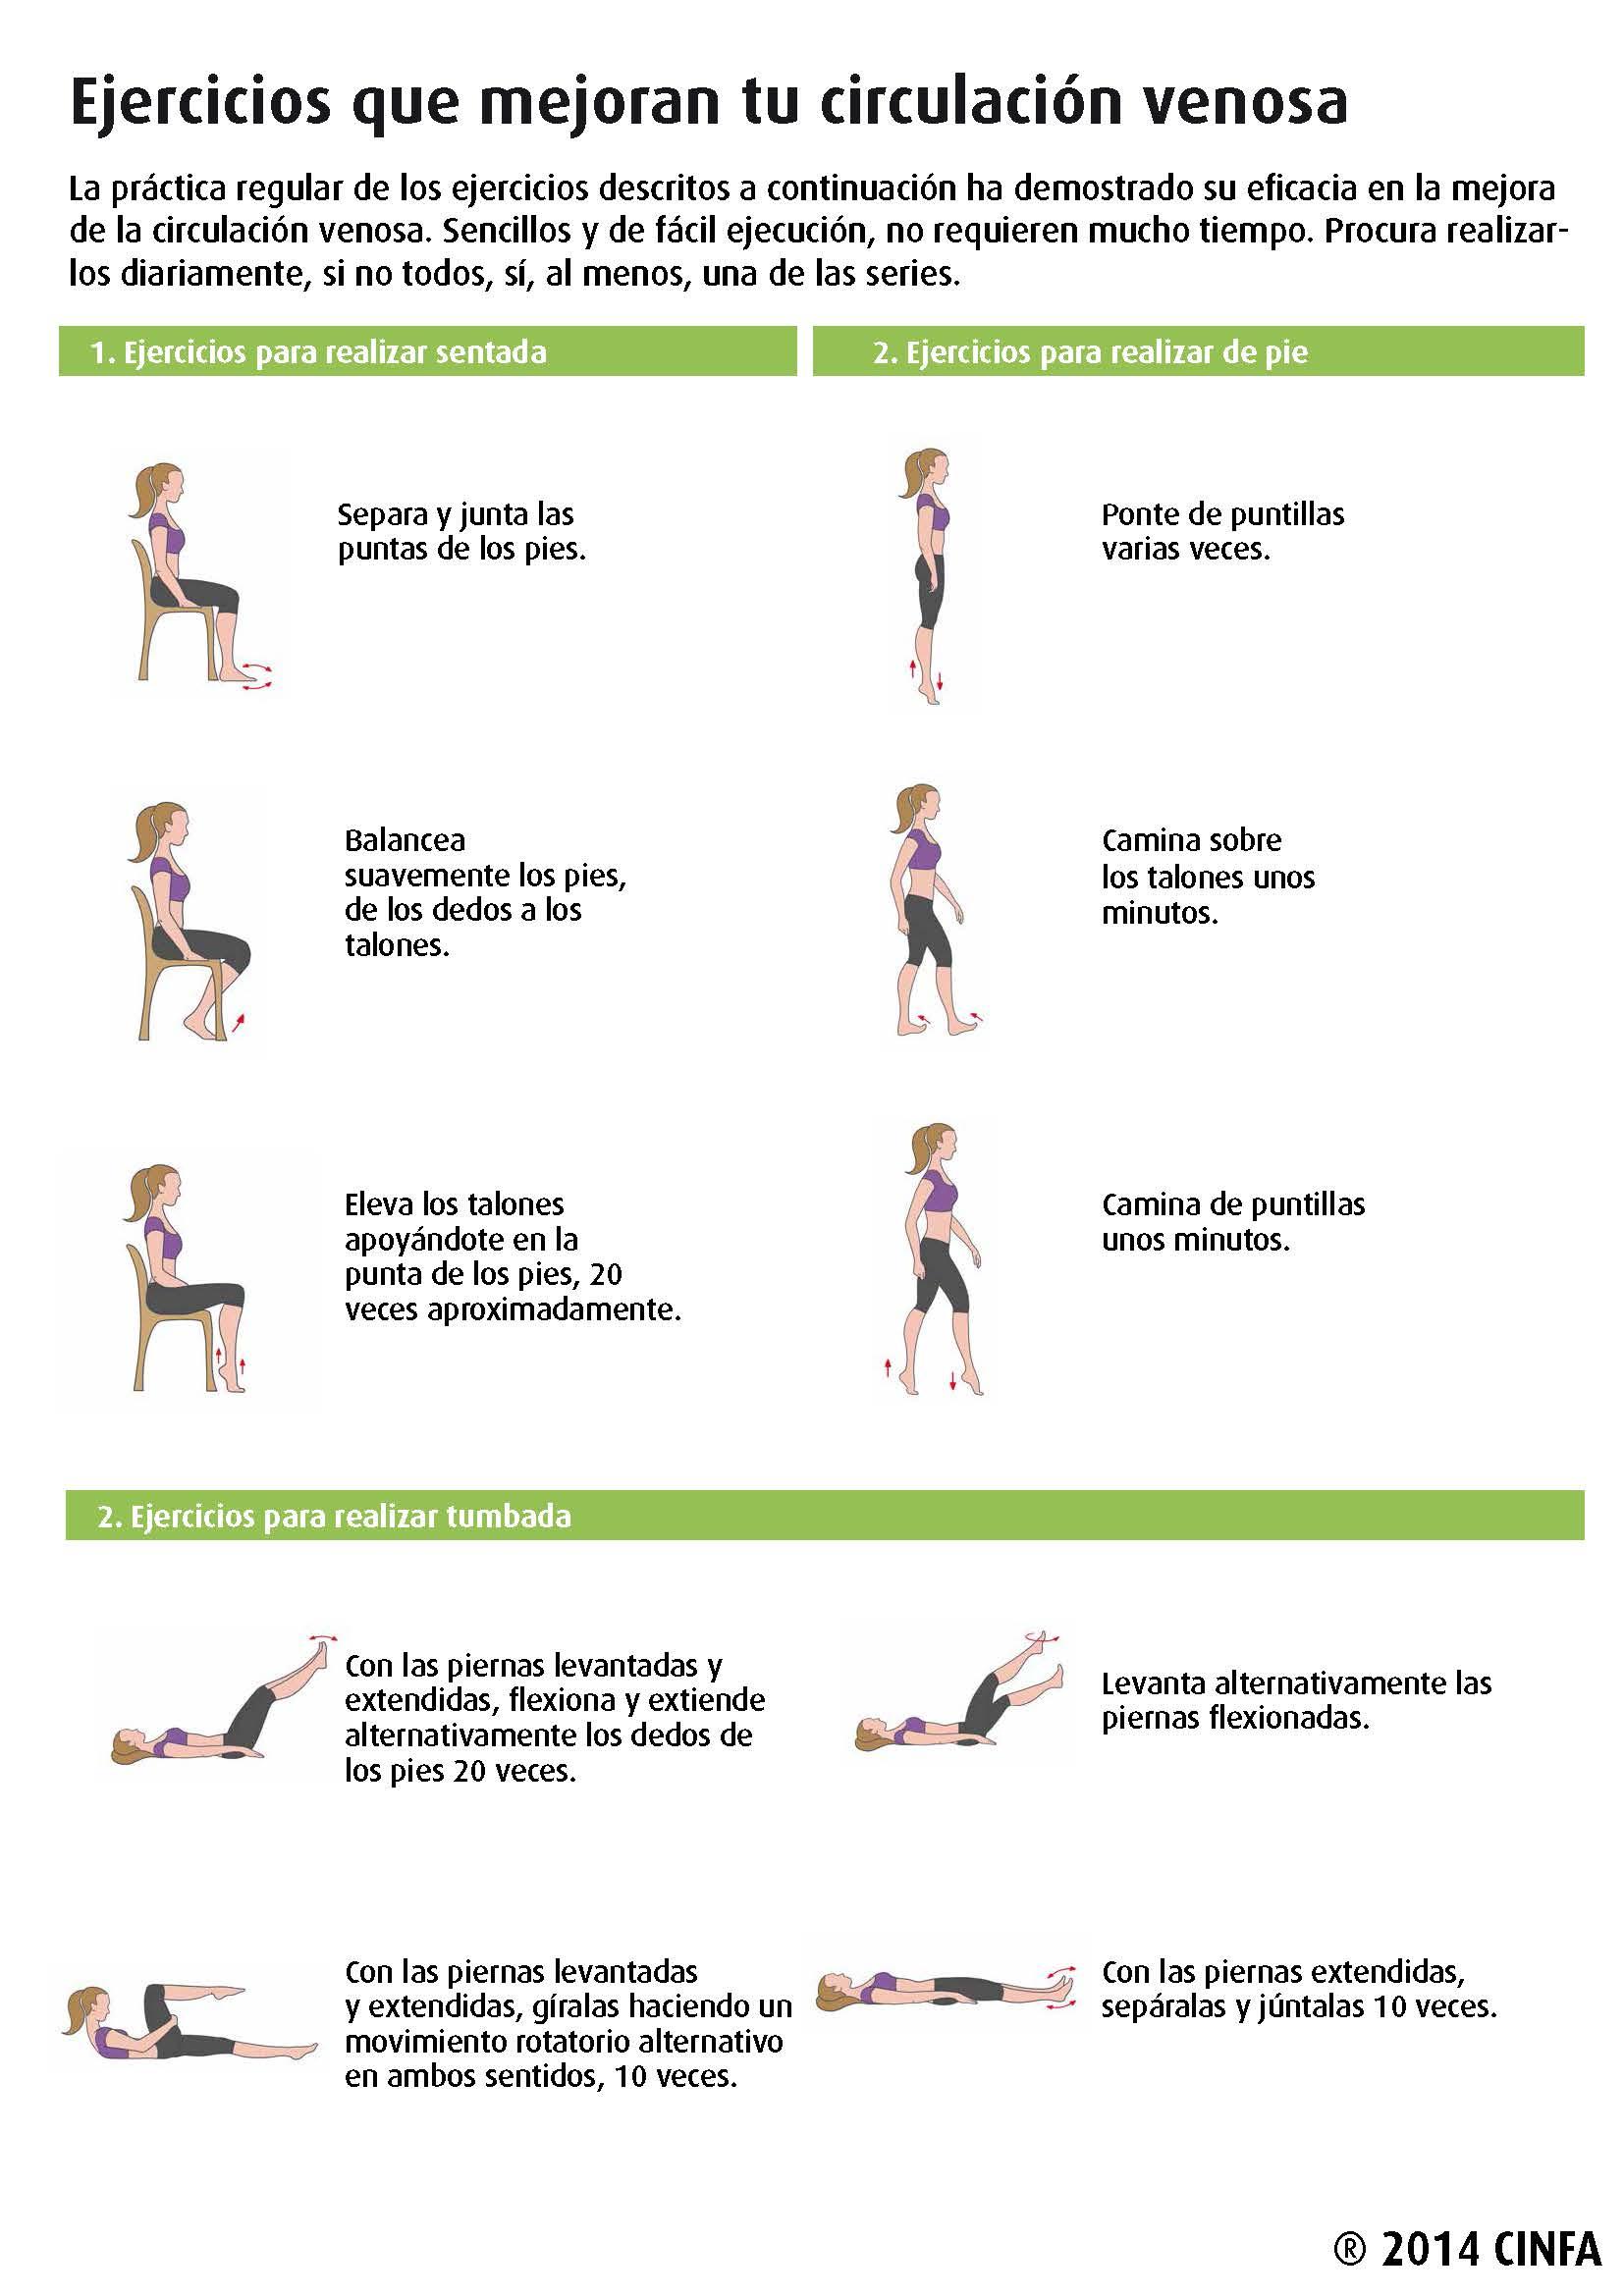 Ficha ejercicios IVC